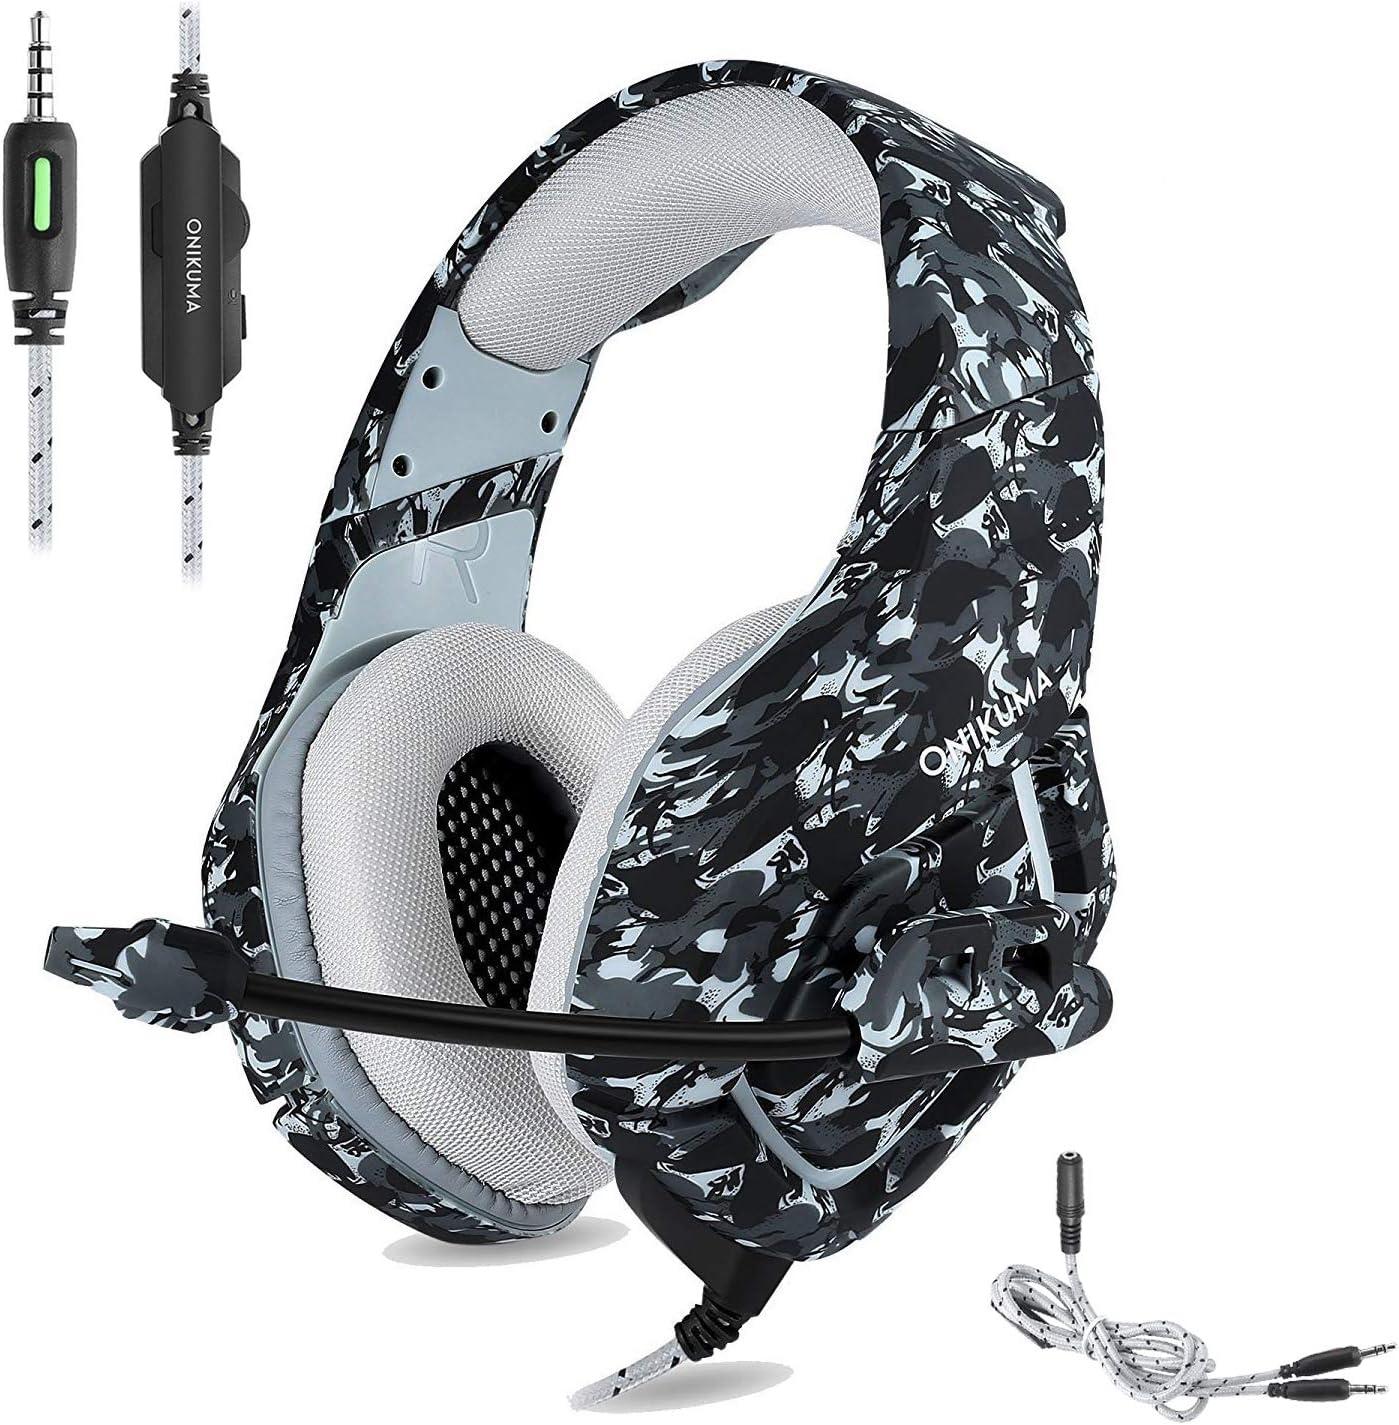 Auriculares para videojuegos PS4 ONIKUMA de camuflaje de 3,5 mm, auriculares para videojuegos estéreo con micrófono de cancelación de ruido para Xbox One S, PC, PS4, Smartphones, Ordenador portátil